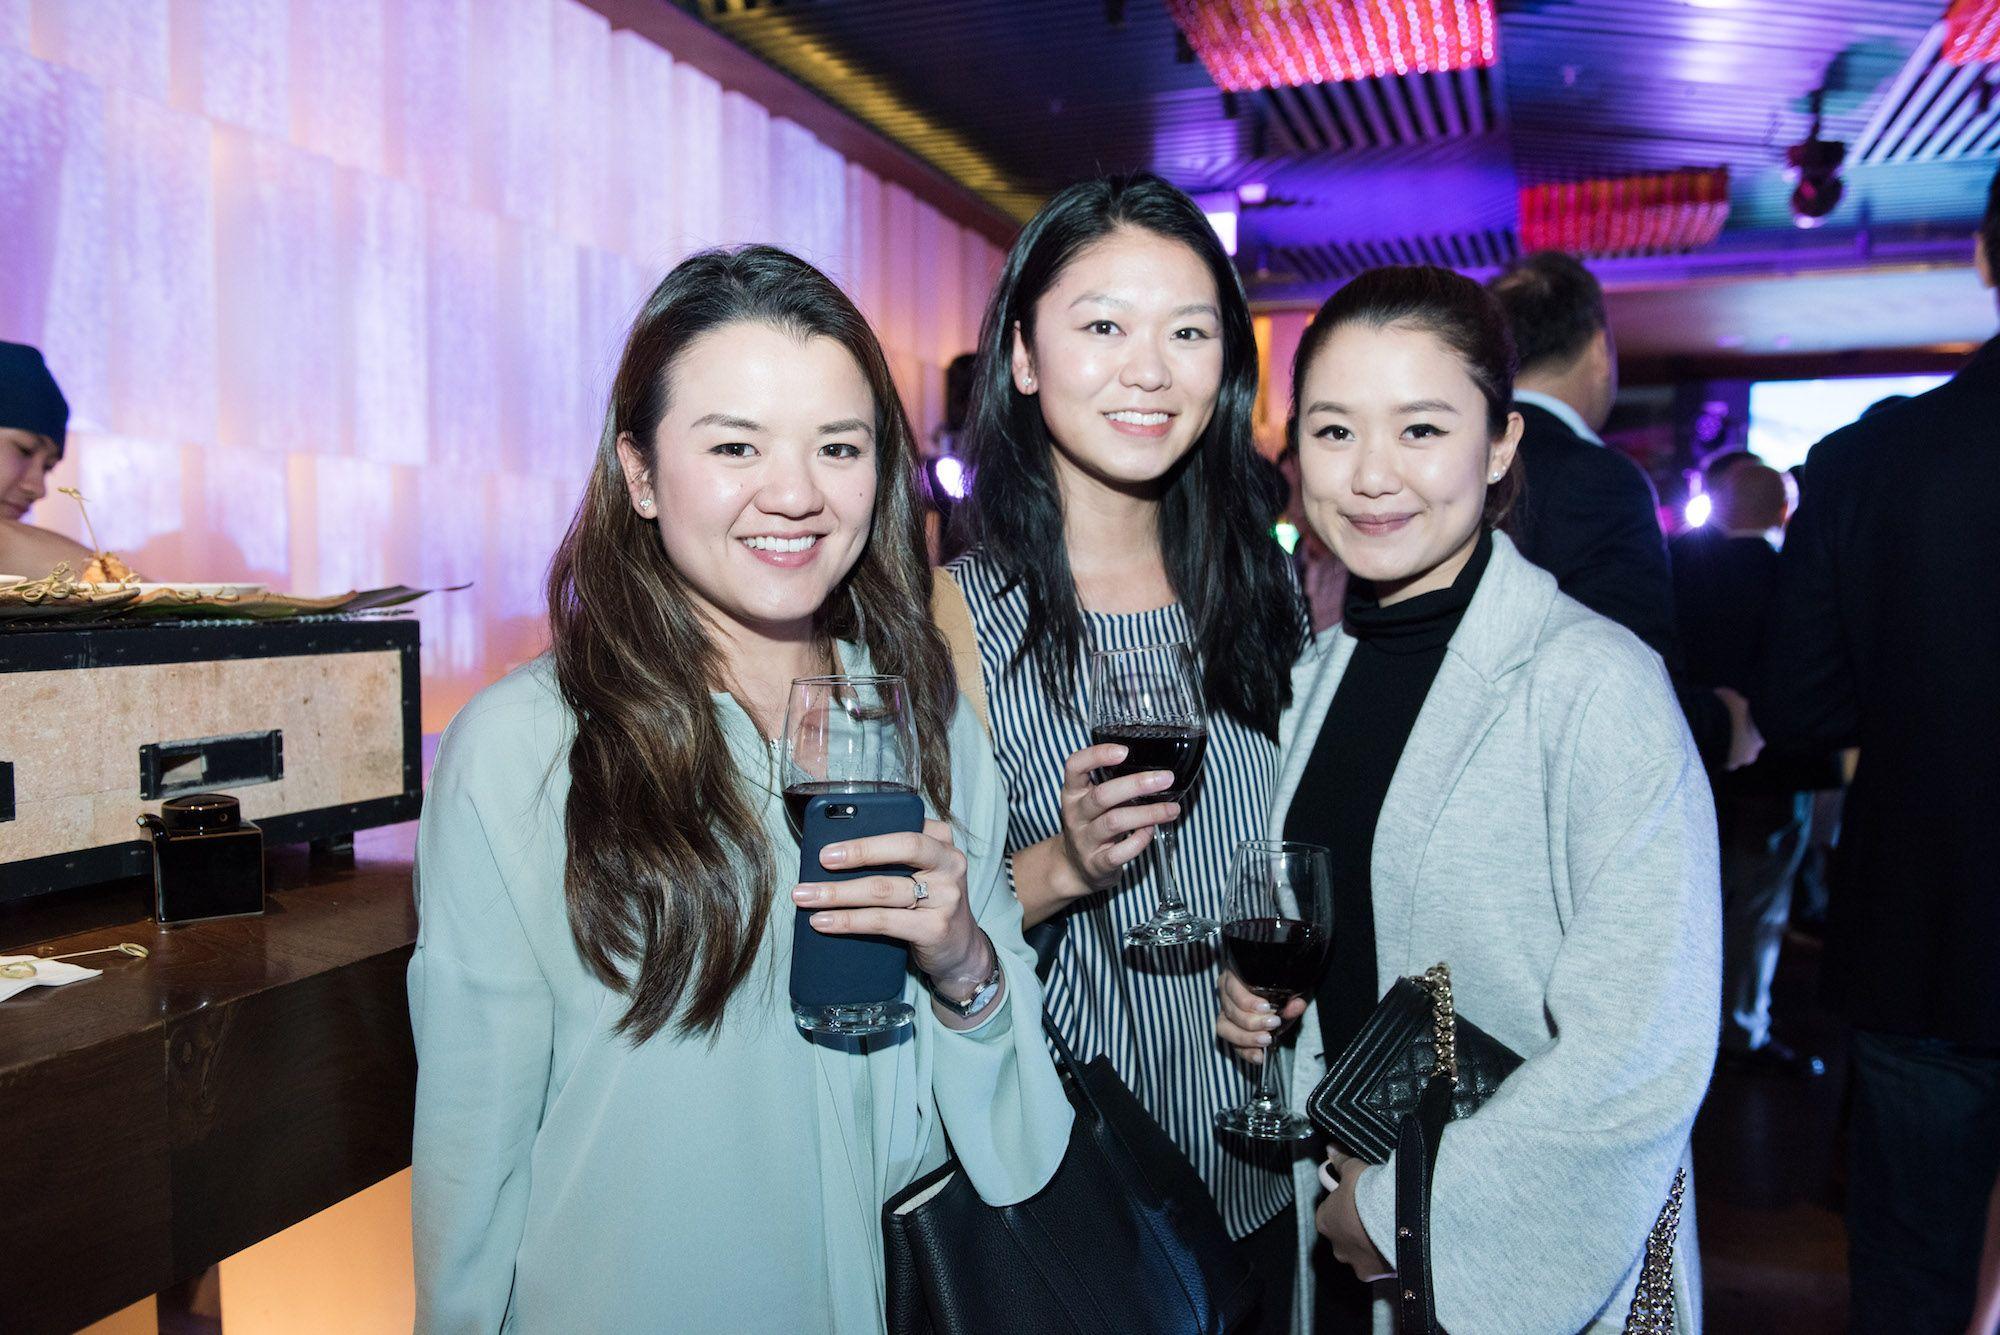 Emerald Shek, Tania Tsang, Pearl Shek